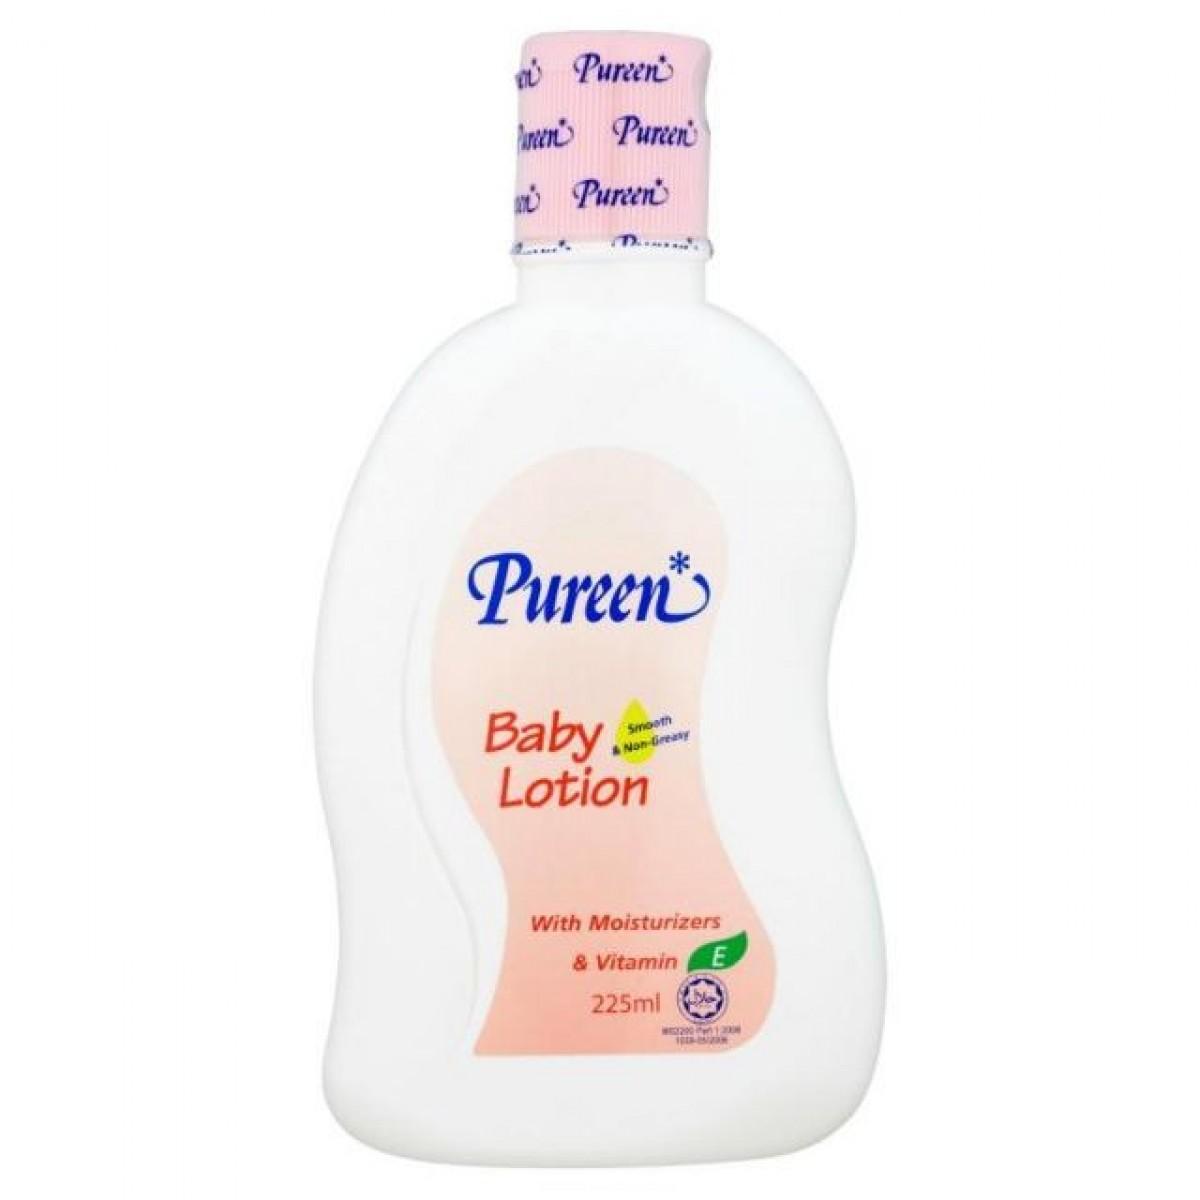 Pureen Baby Lotion (225ml) - Kico Baby Center